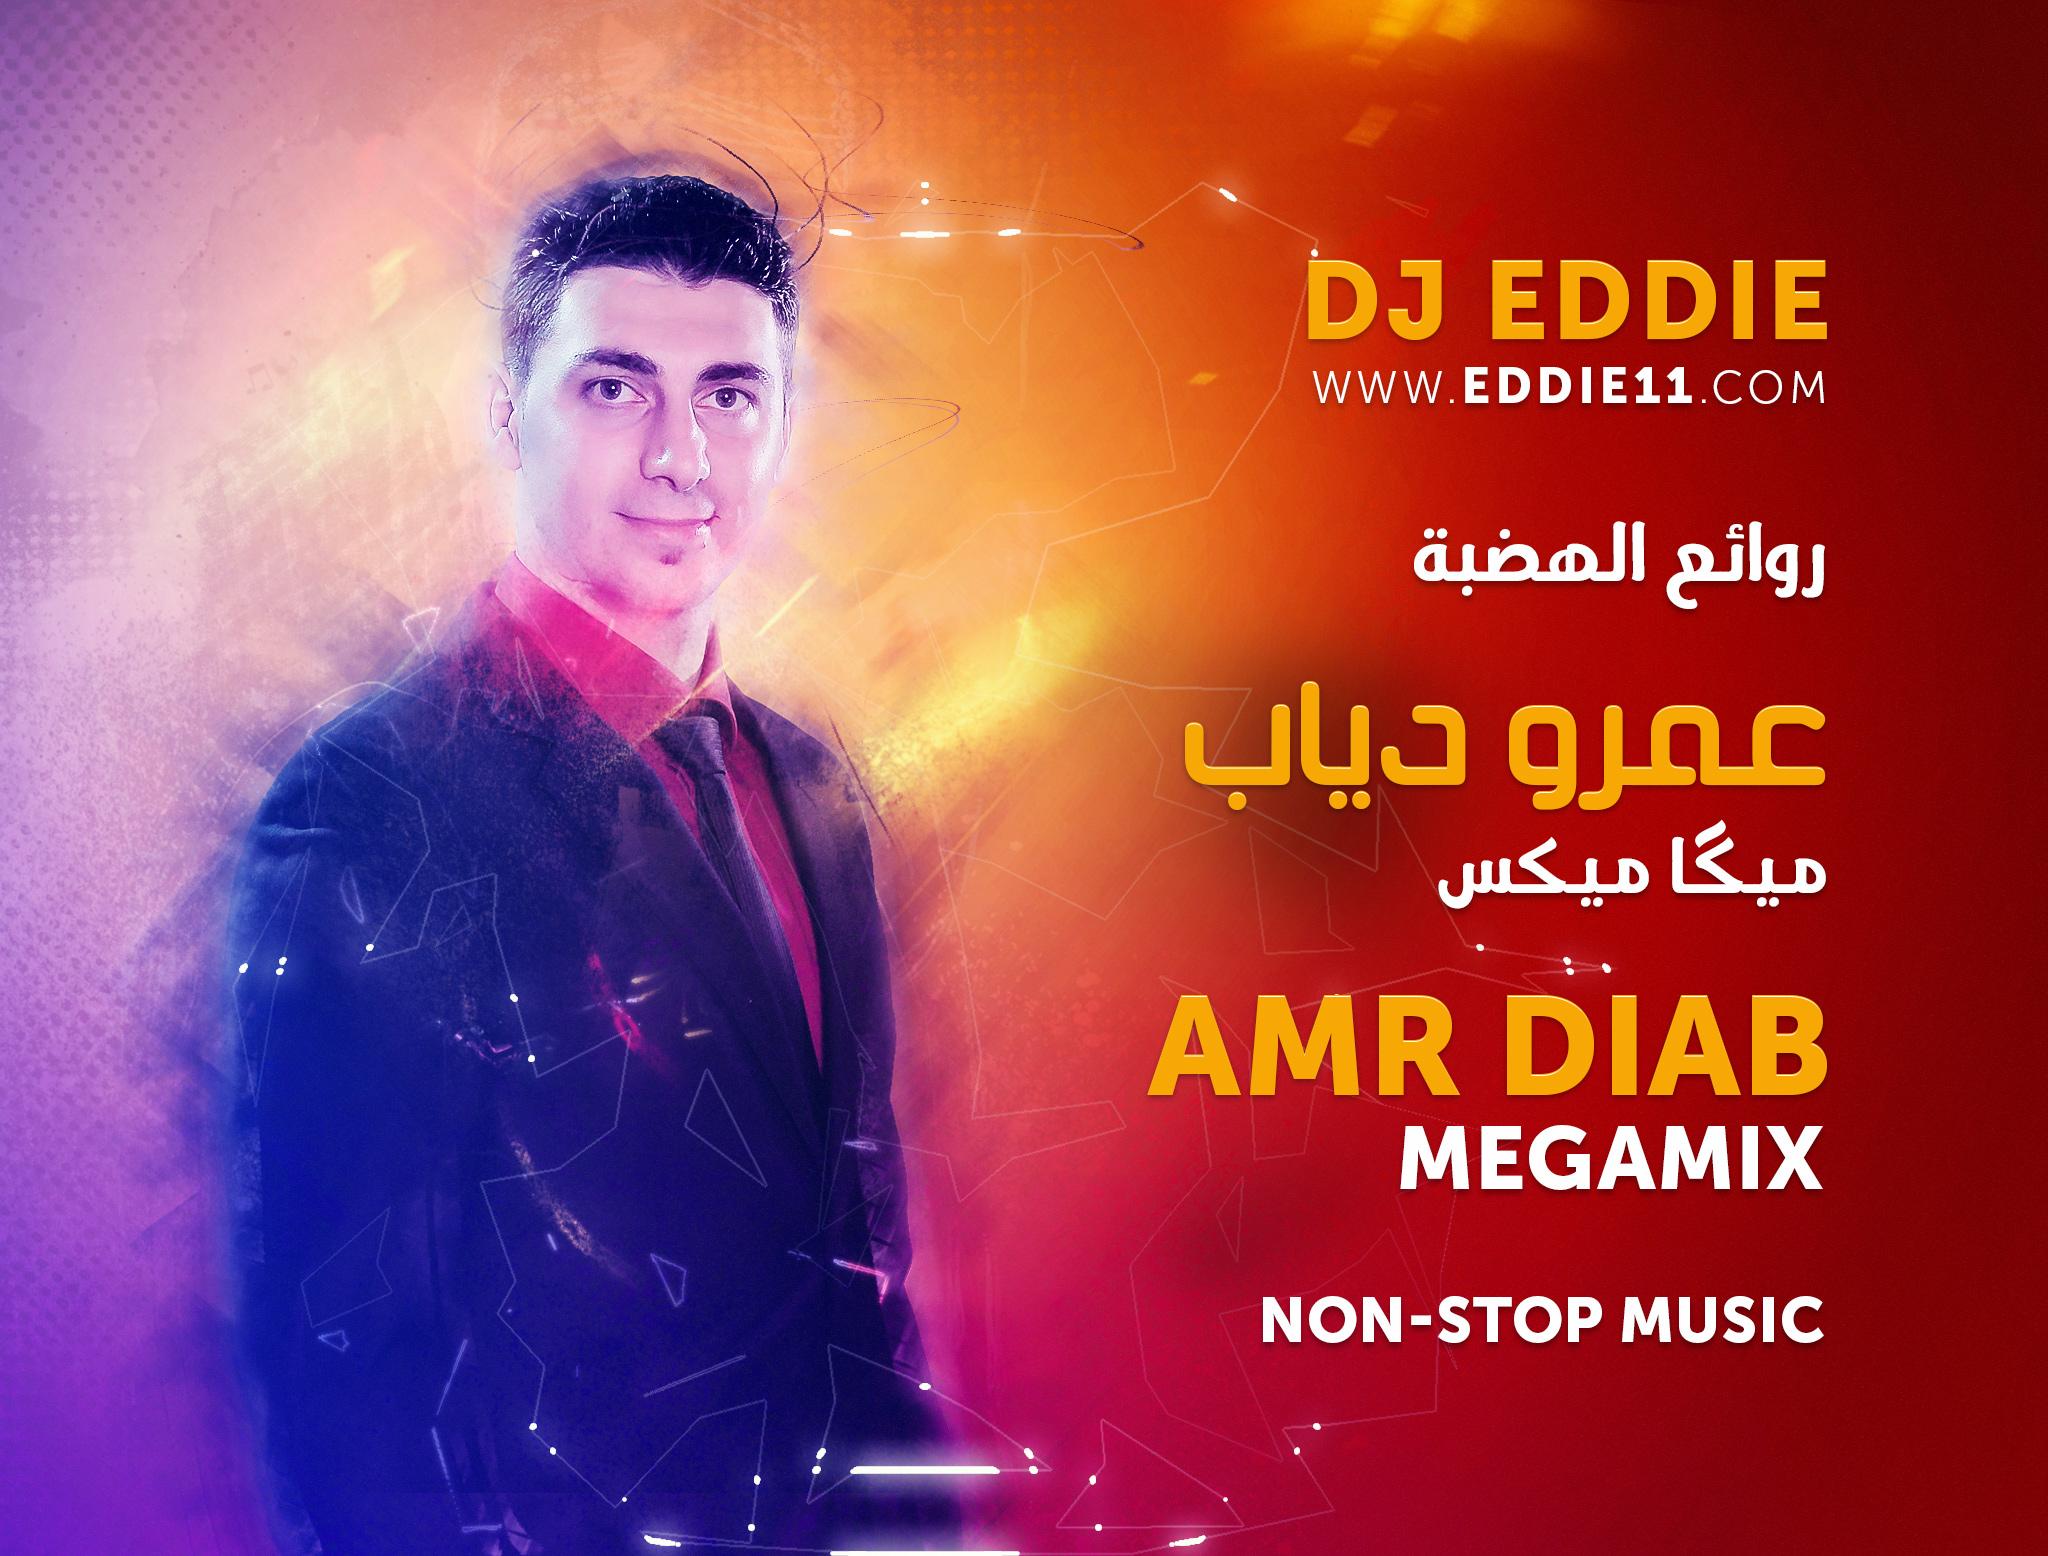 DJ Eddie - Amr Diab Non-stop MegaMix ميكس روائع عمرو دياب